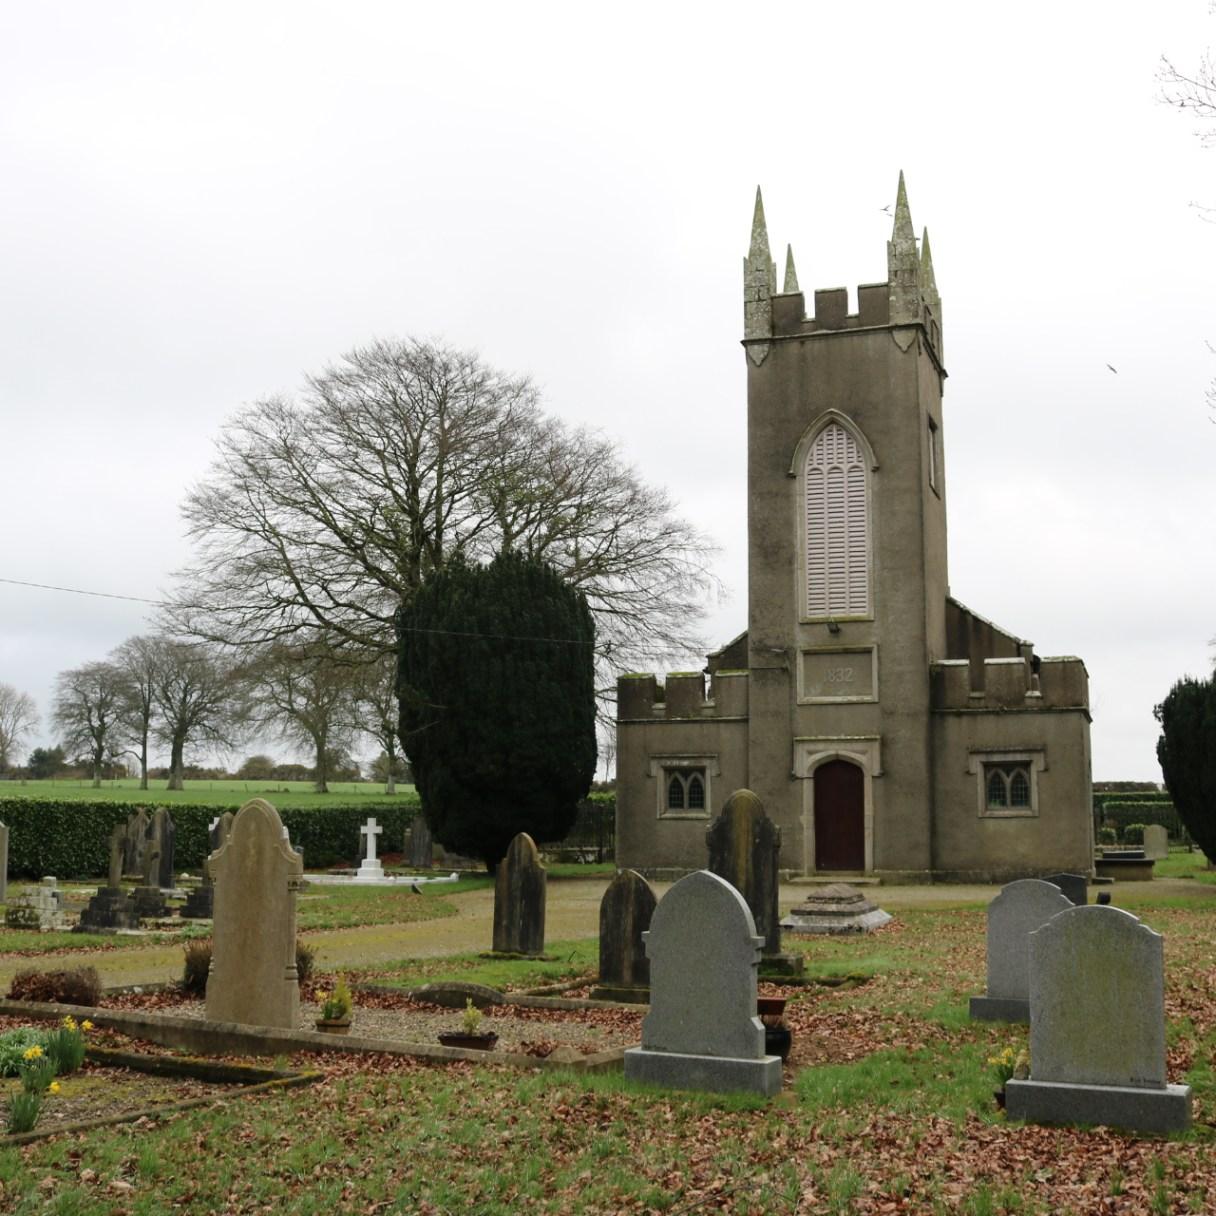 Clonmore Church of Ireland Bree 2017-03-10 15.01.48 (4)